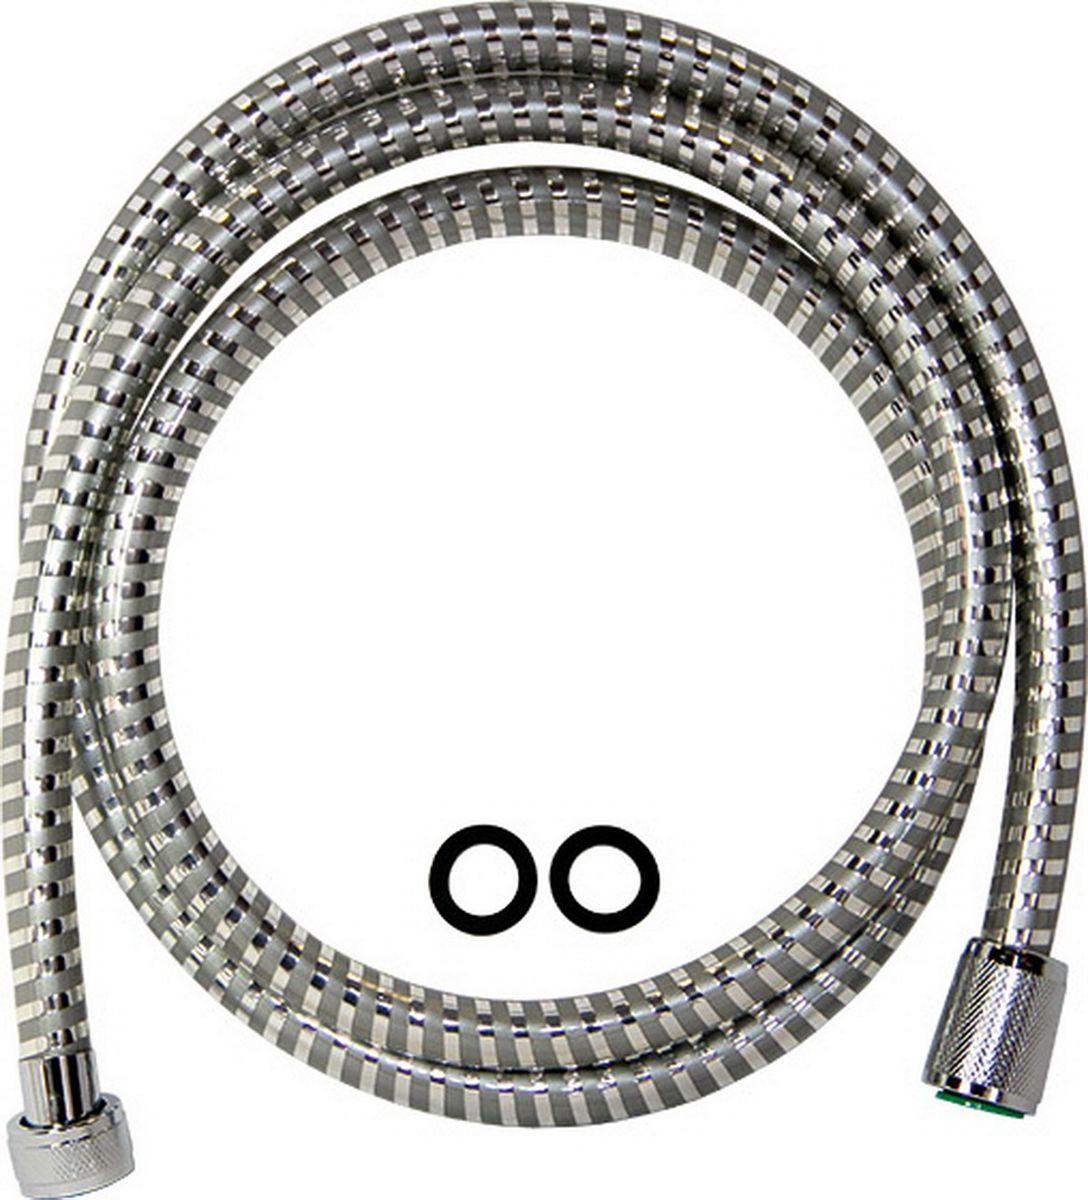 Argo шланг для душа, 1/2, PVC Еspiroflex Grey, 165 см34549Шланг для душа Argo 1/2, pvc espiroflex grey, 165 см